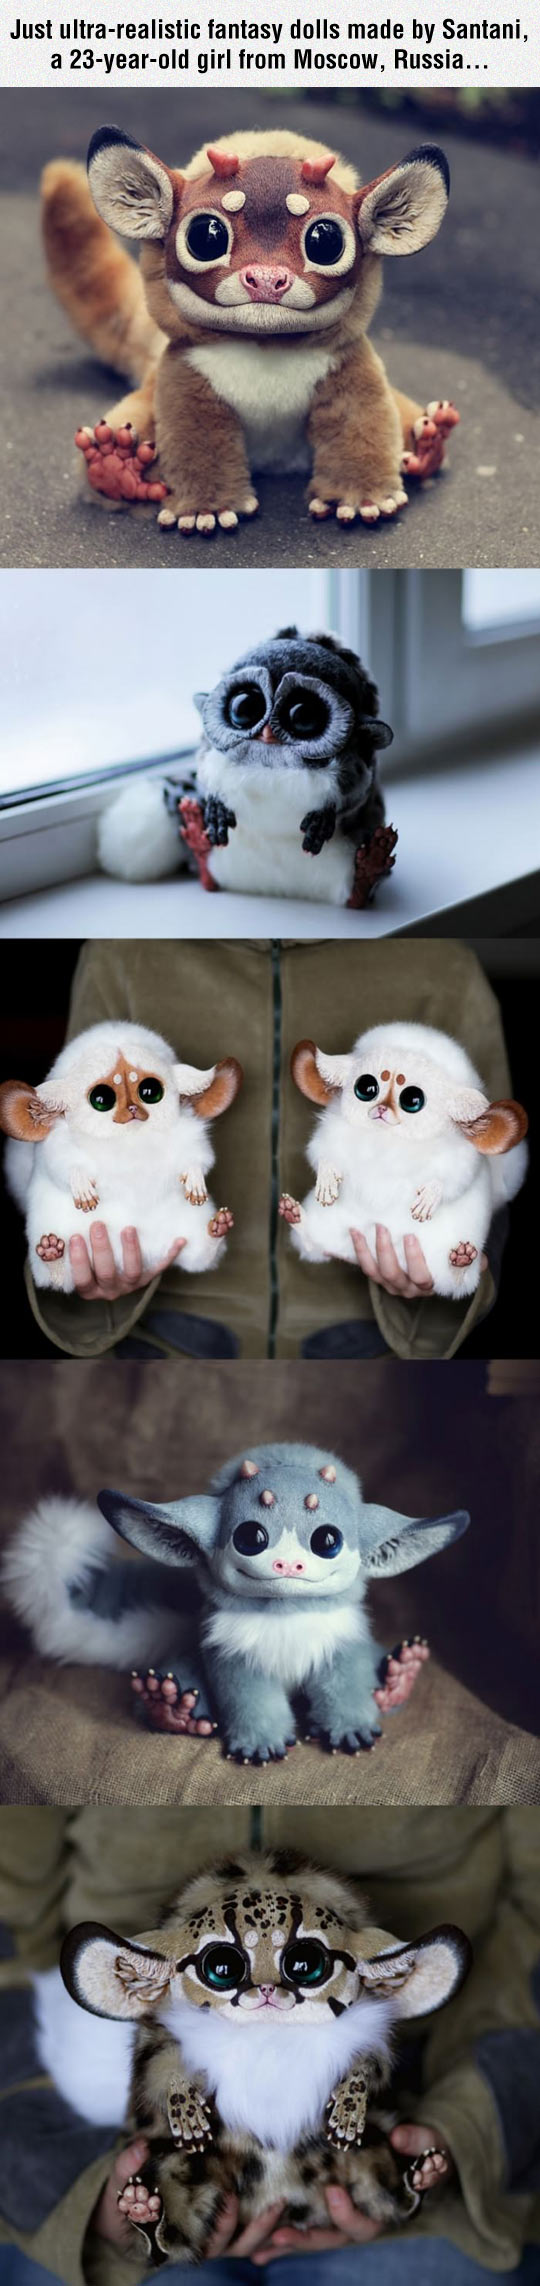 Ultra-Realistic Fantasy Dolls By Santani